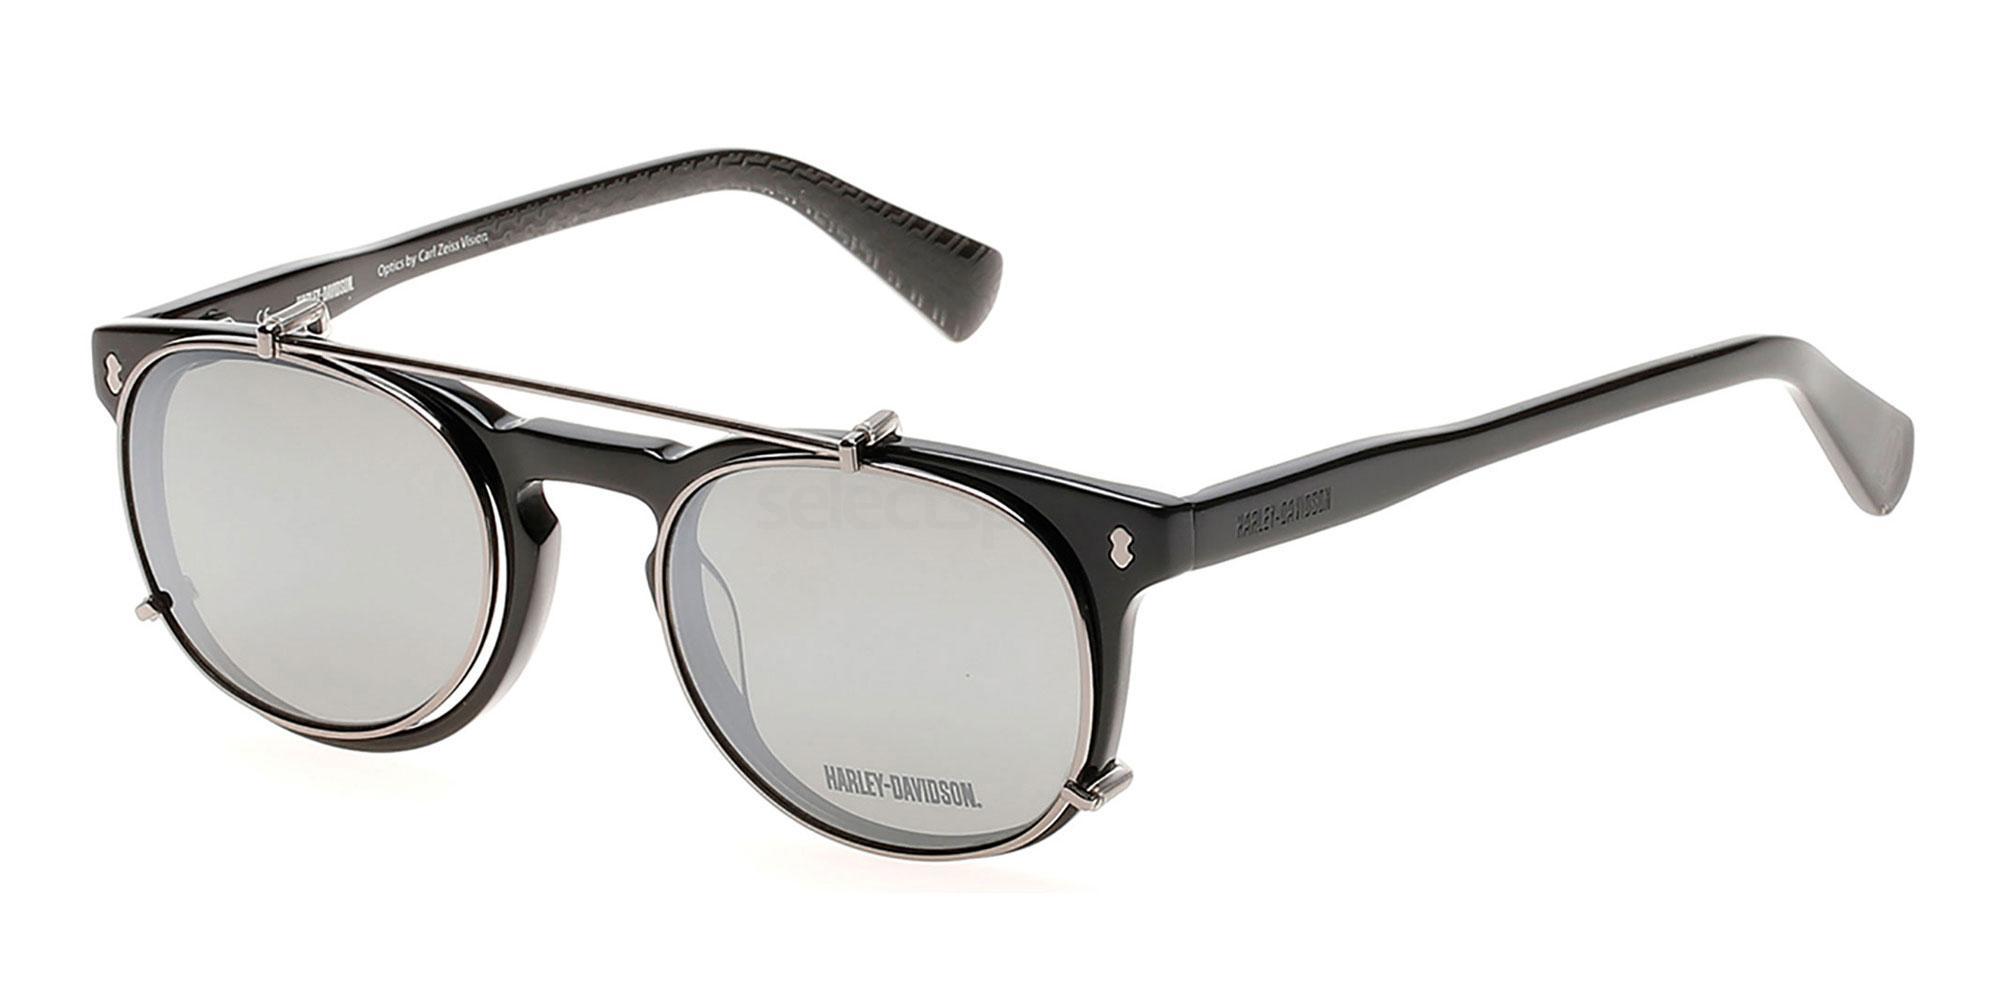 01C HD 1006 Glasses, Harley Davidson